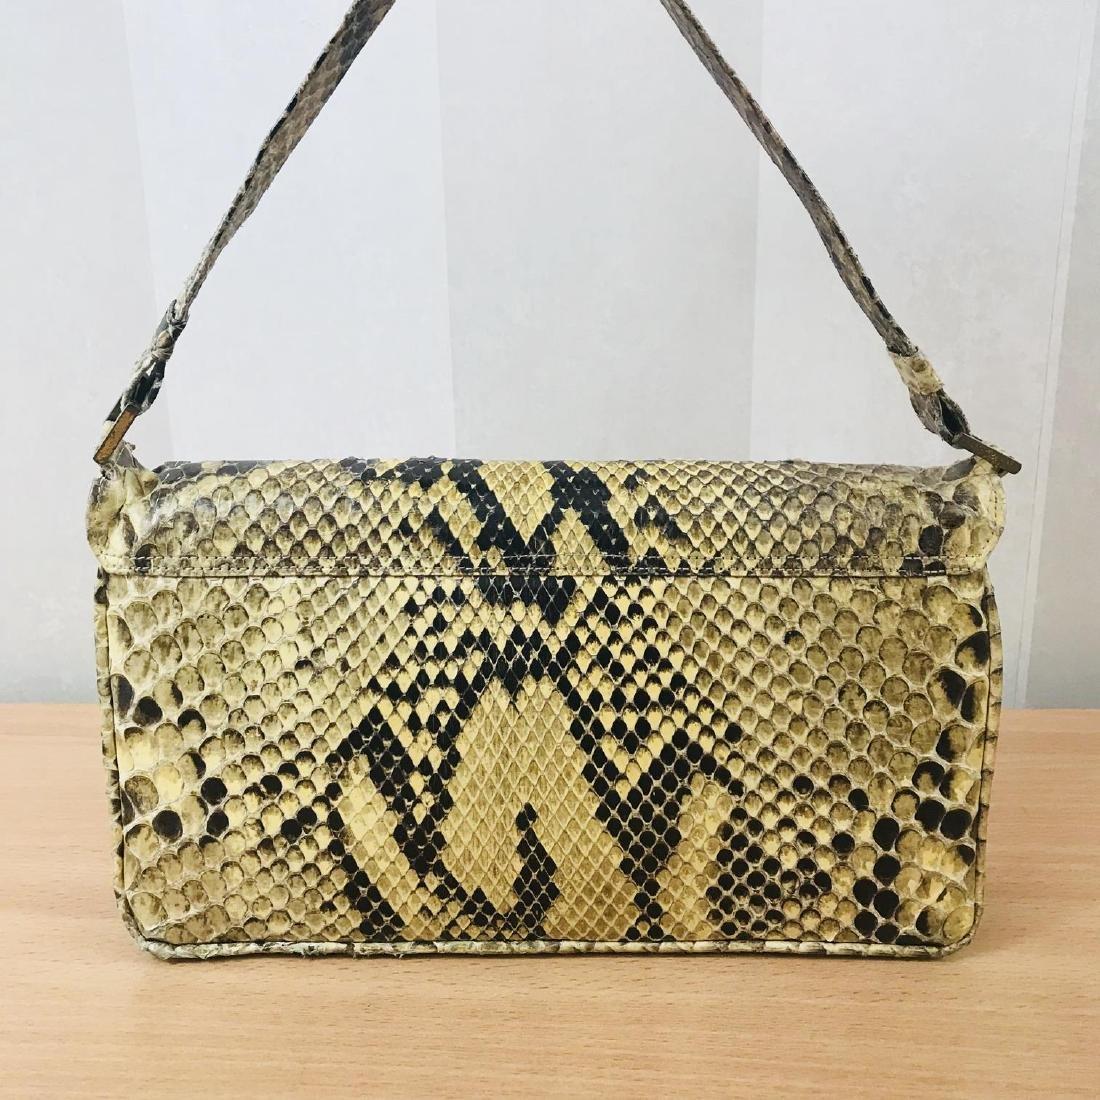 Vintage Snakeskin Leather Handbag - 5